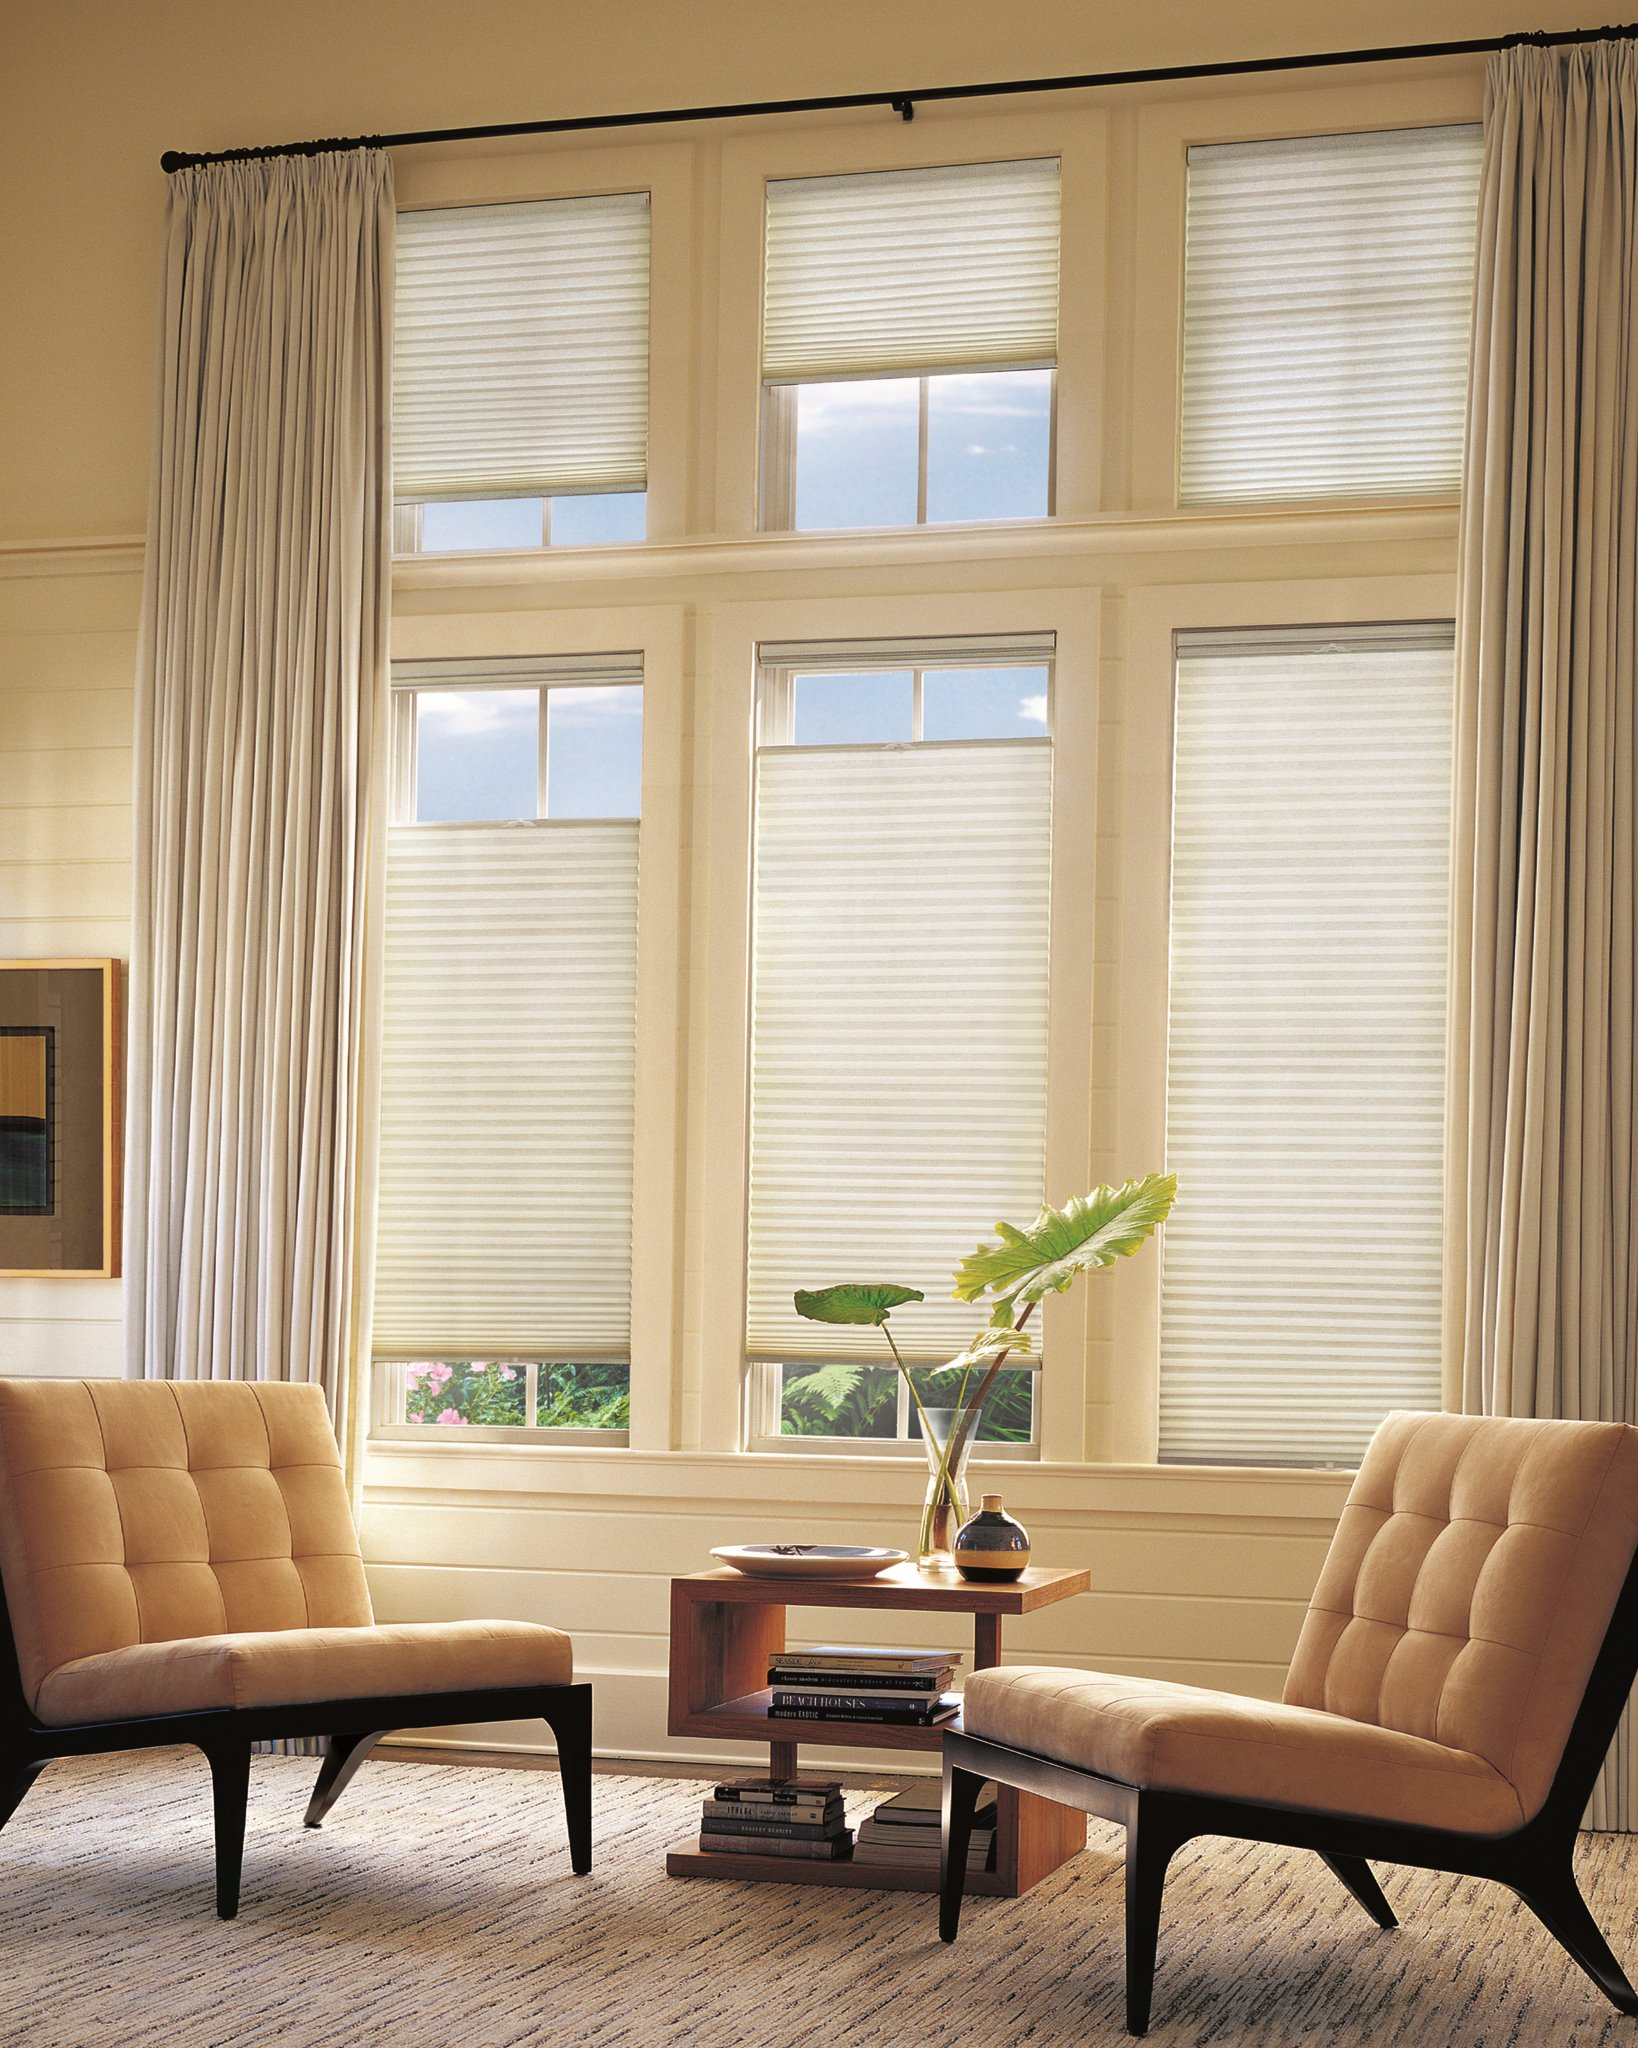 Living room window treatment